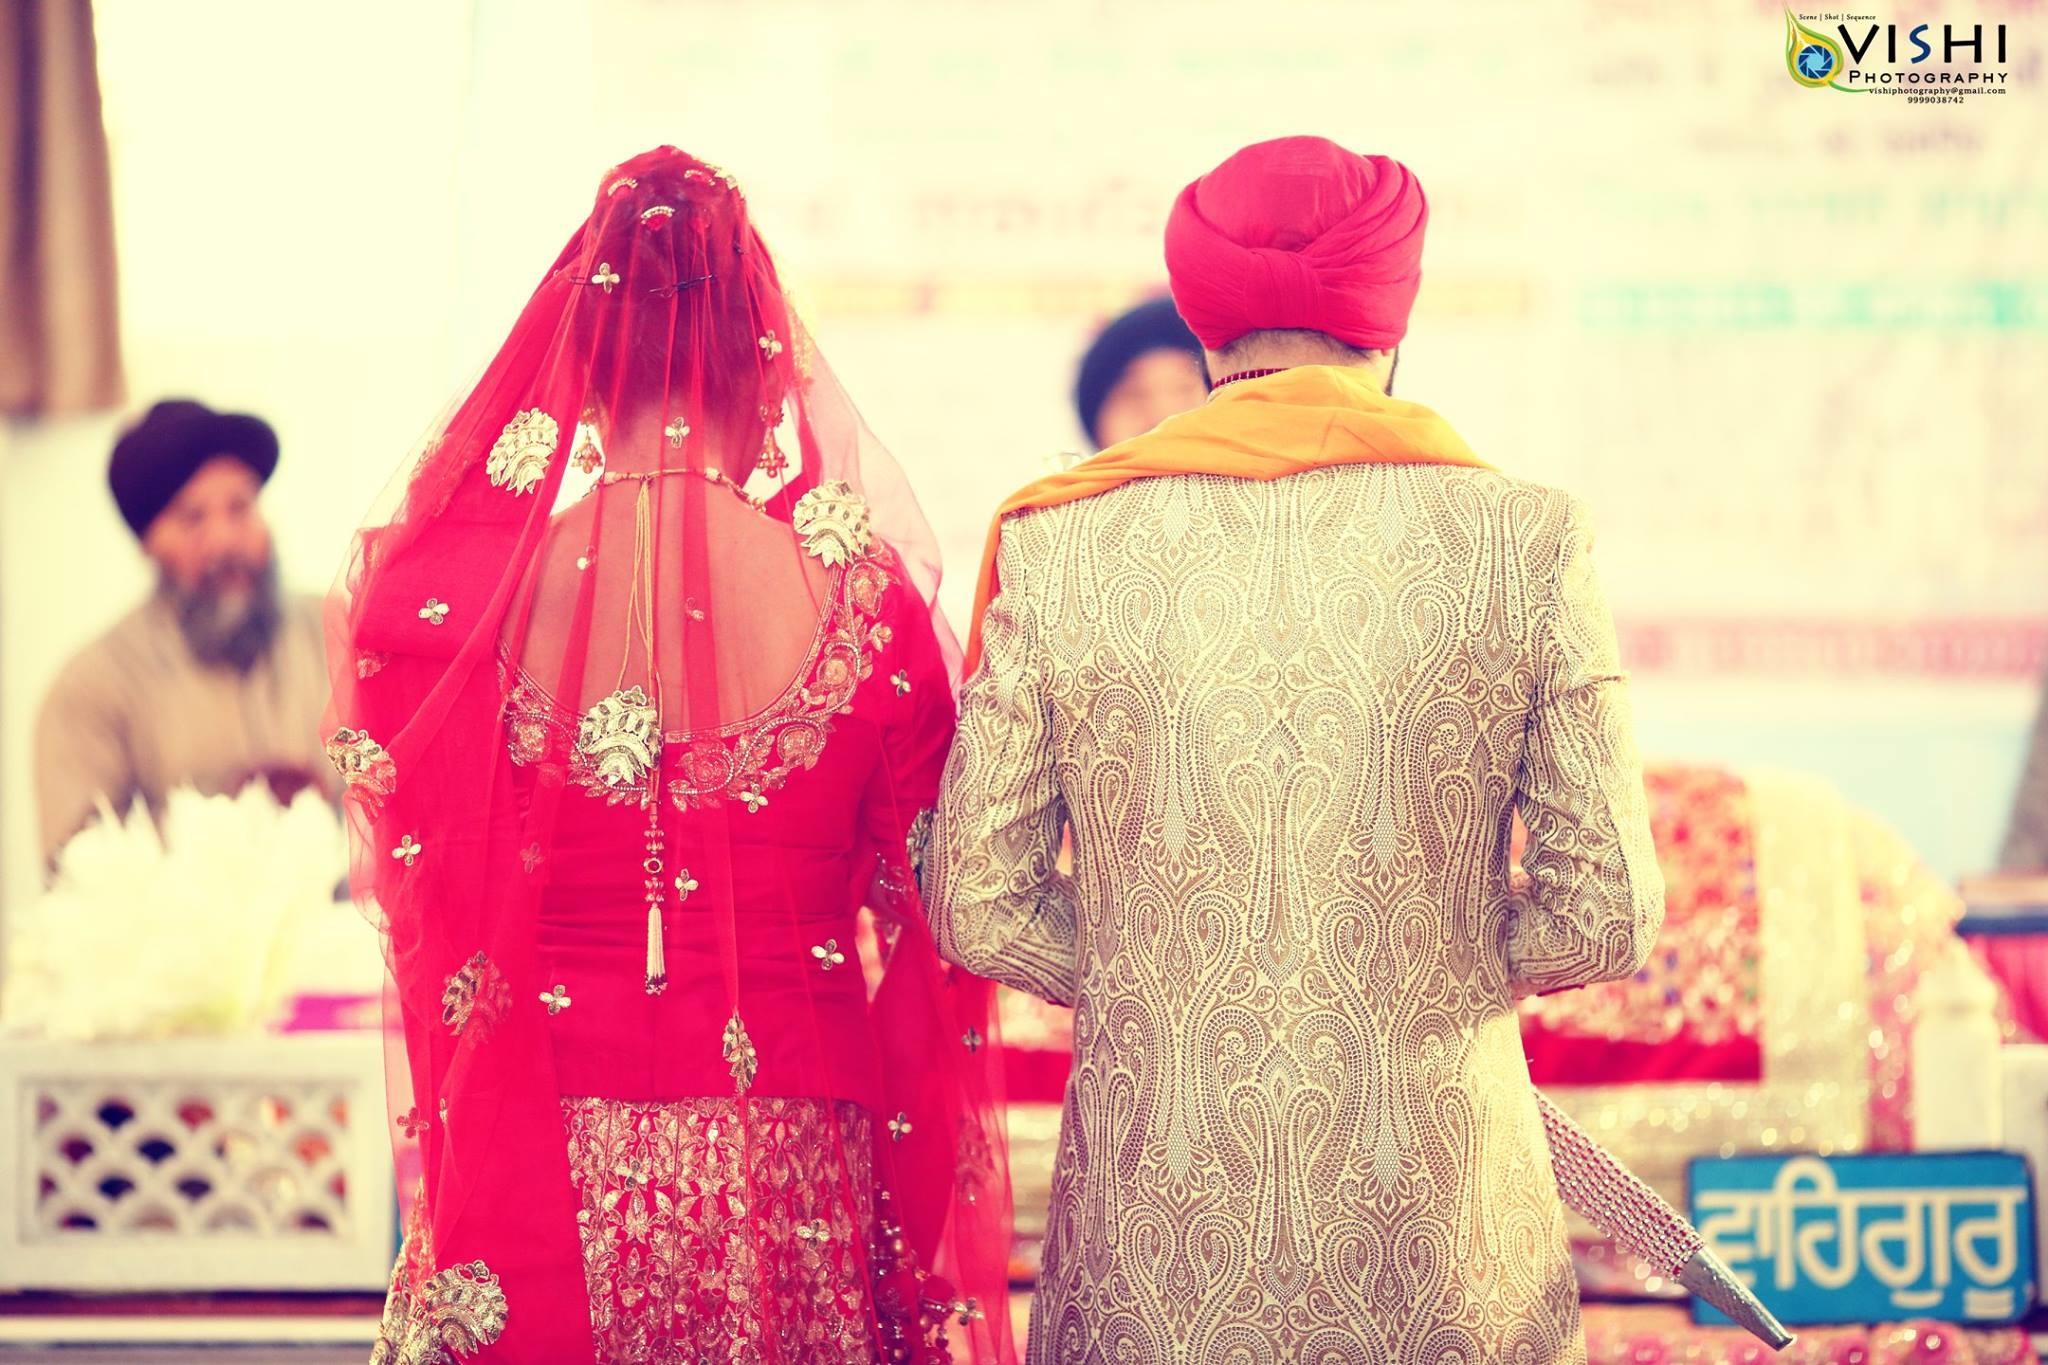 Vishi Photography